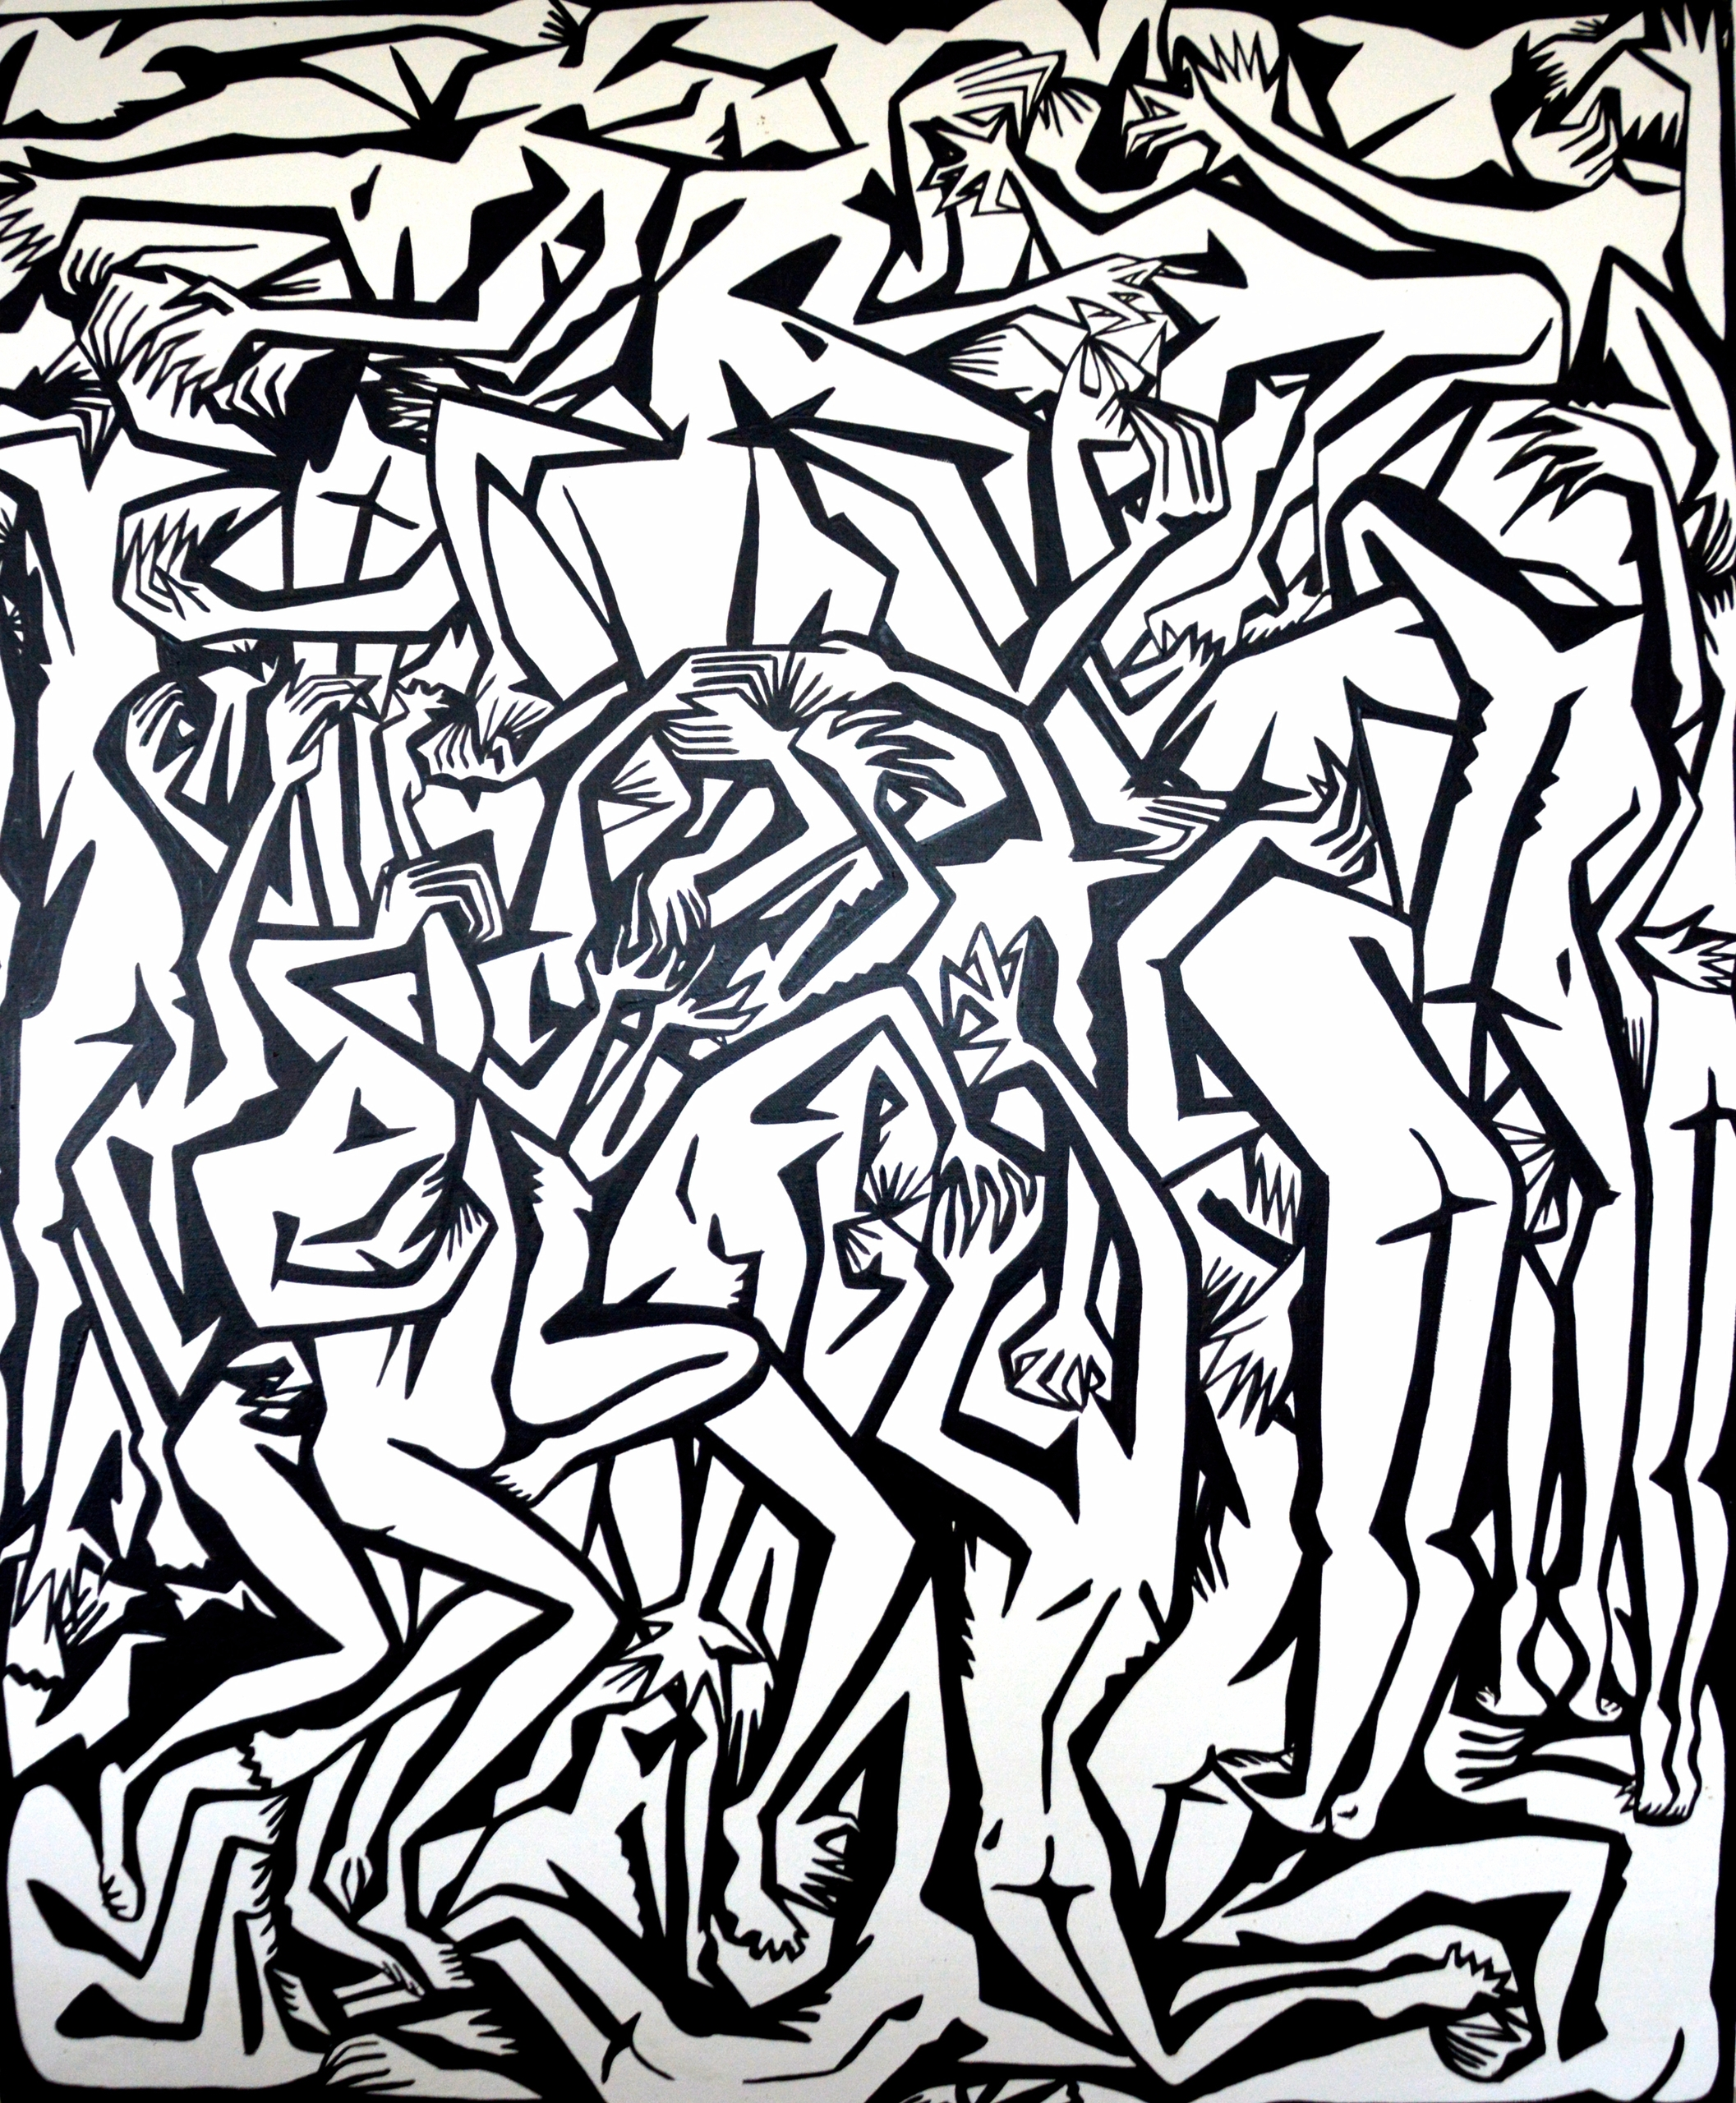 work arises explores realm huma - matlakas   ello